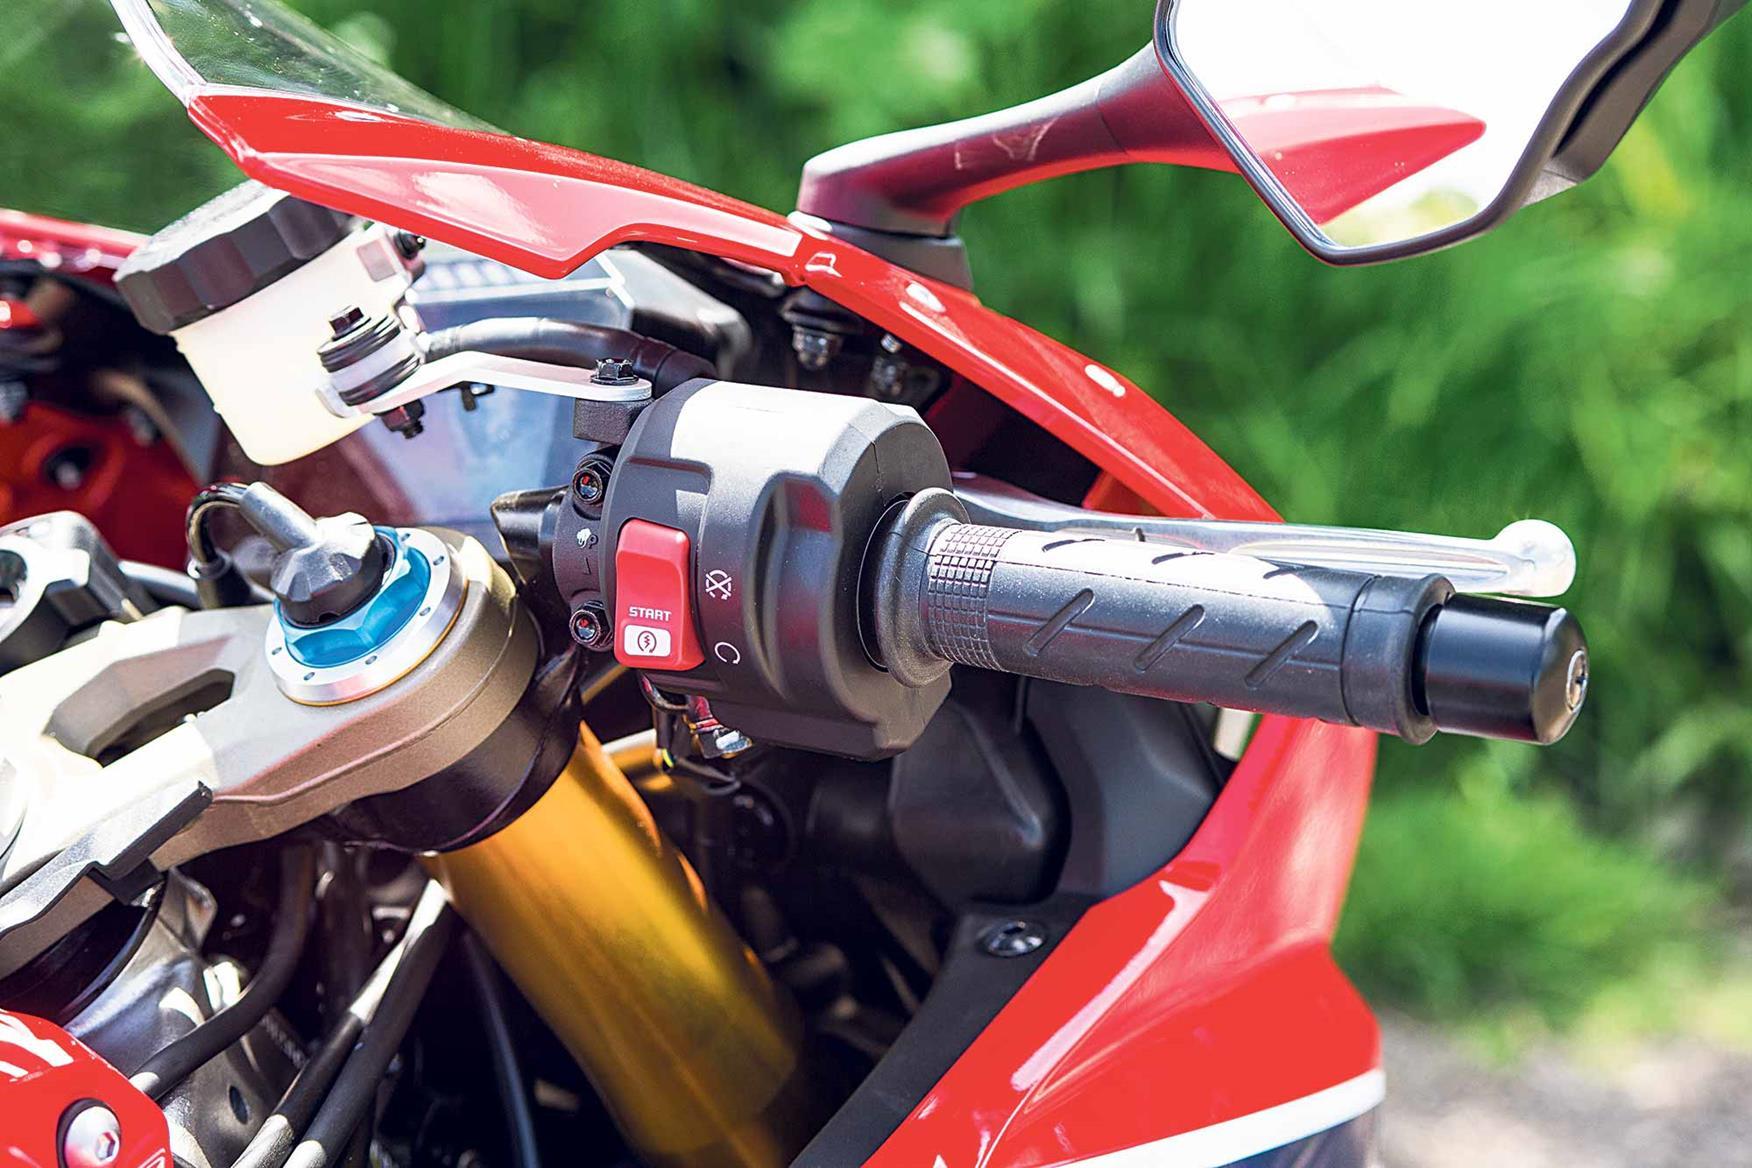 Honda Fireblade SP switchgear